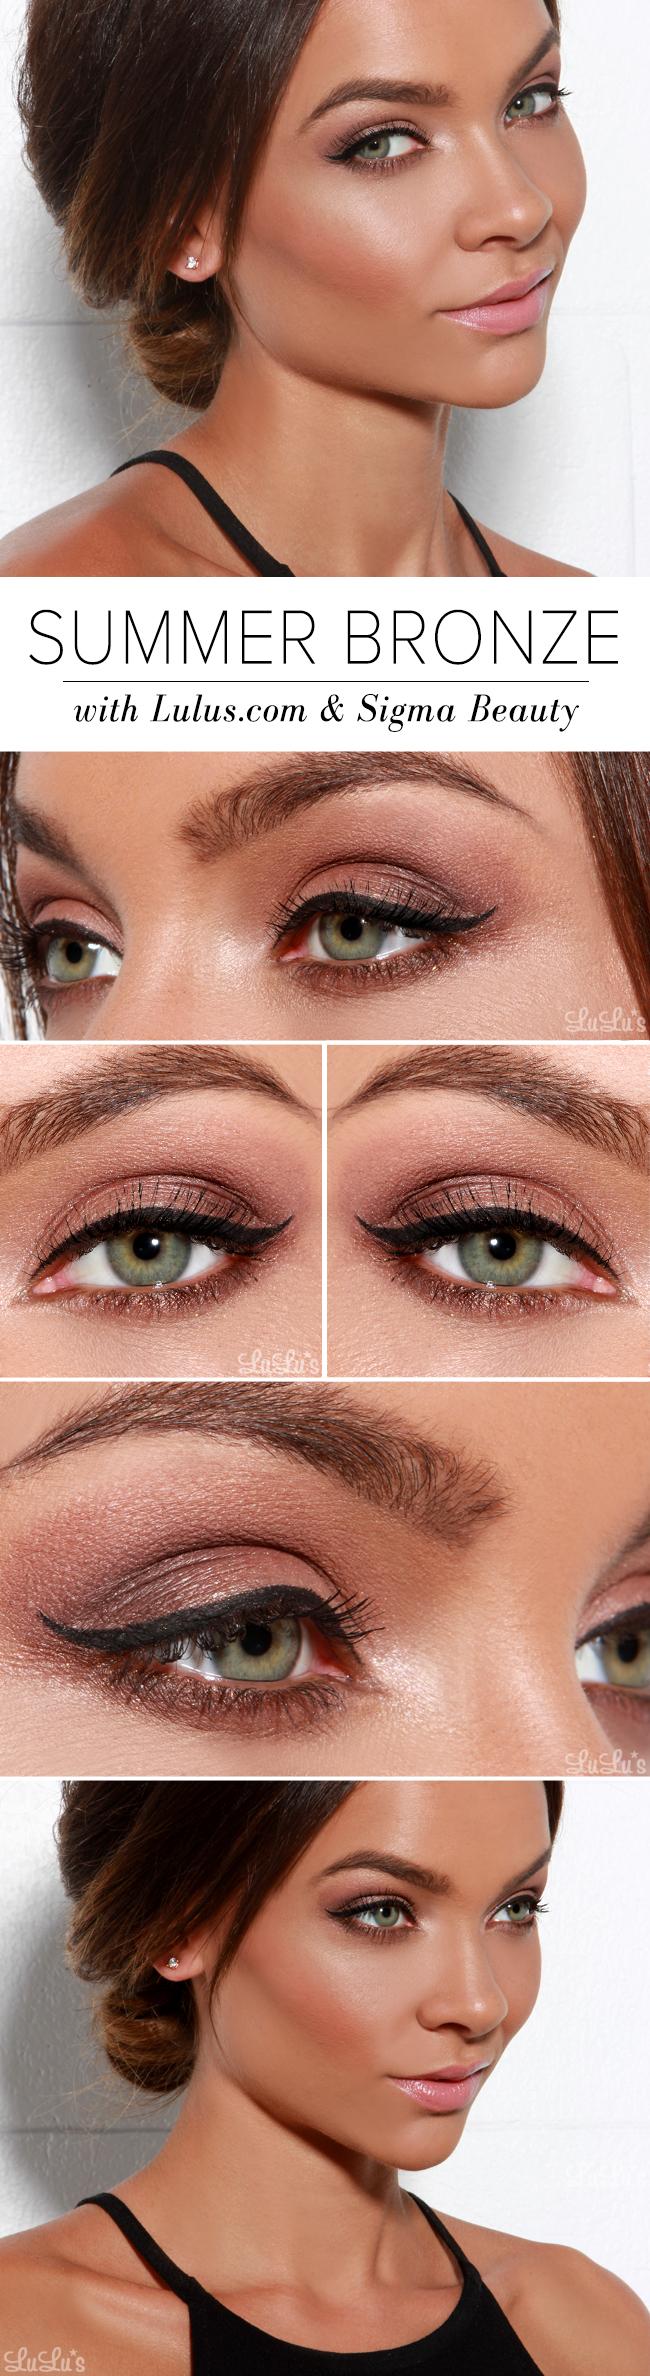 Summer Bronze Makeup